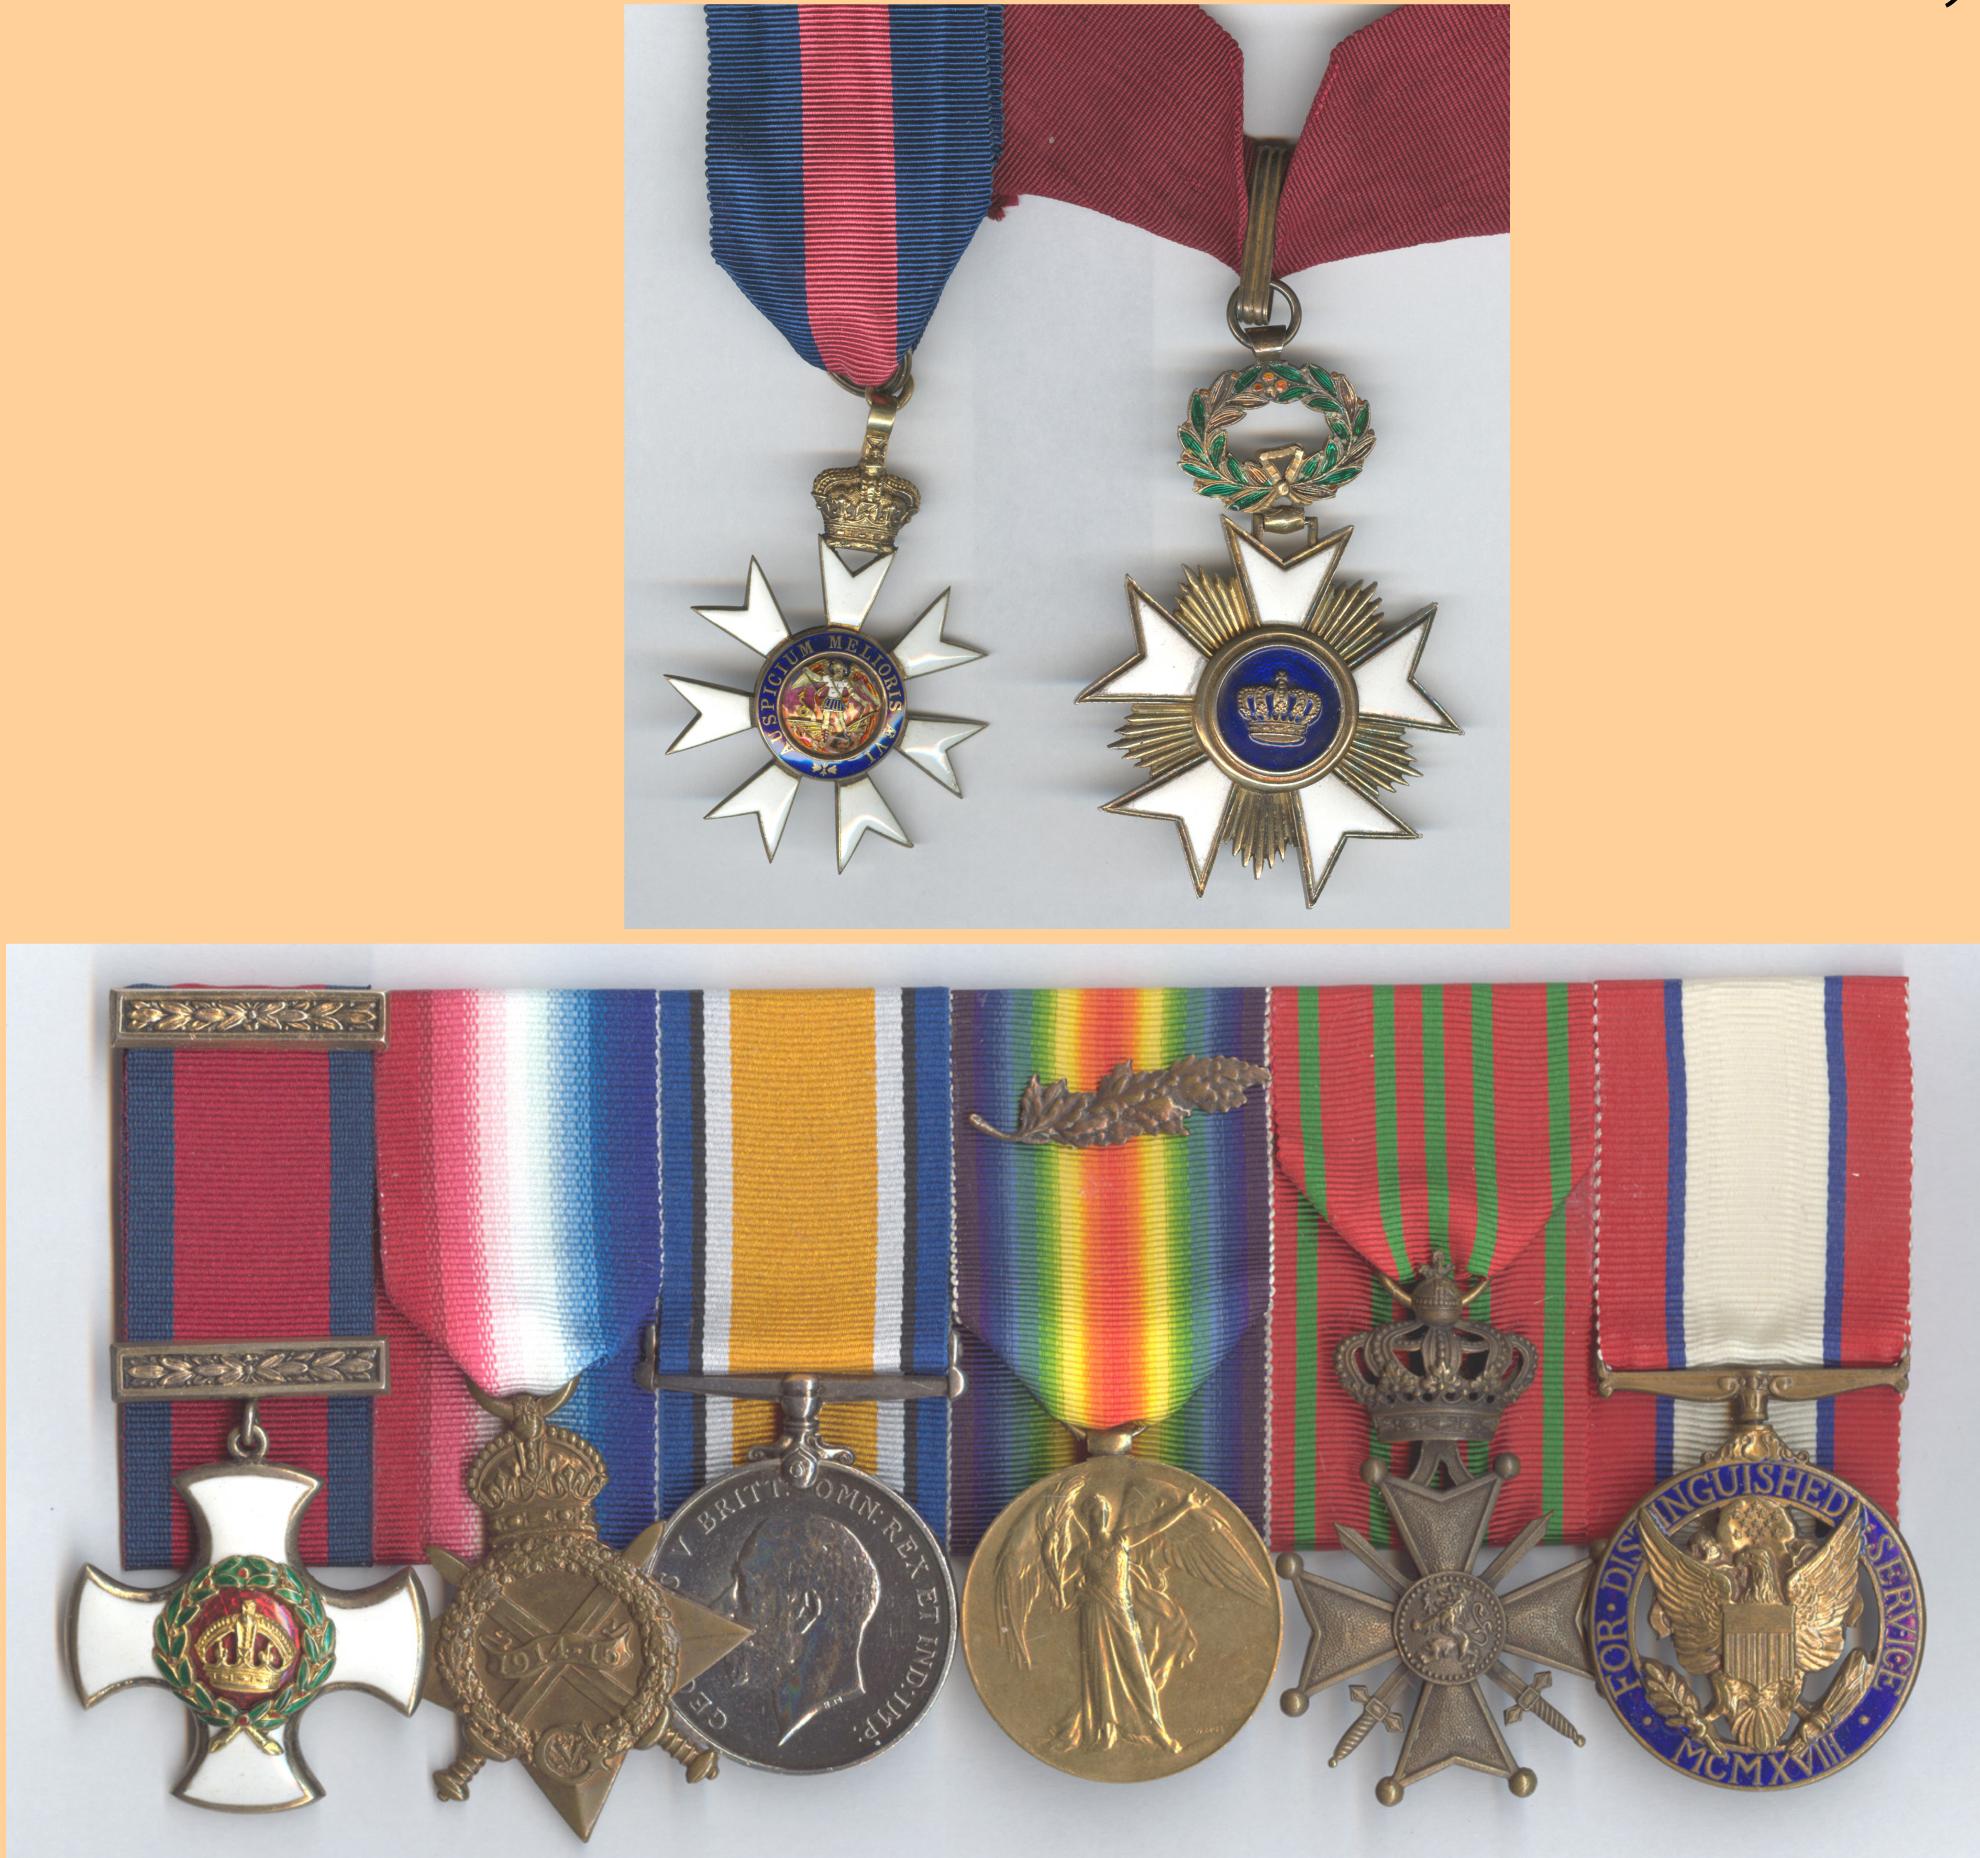 Pritchard medals